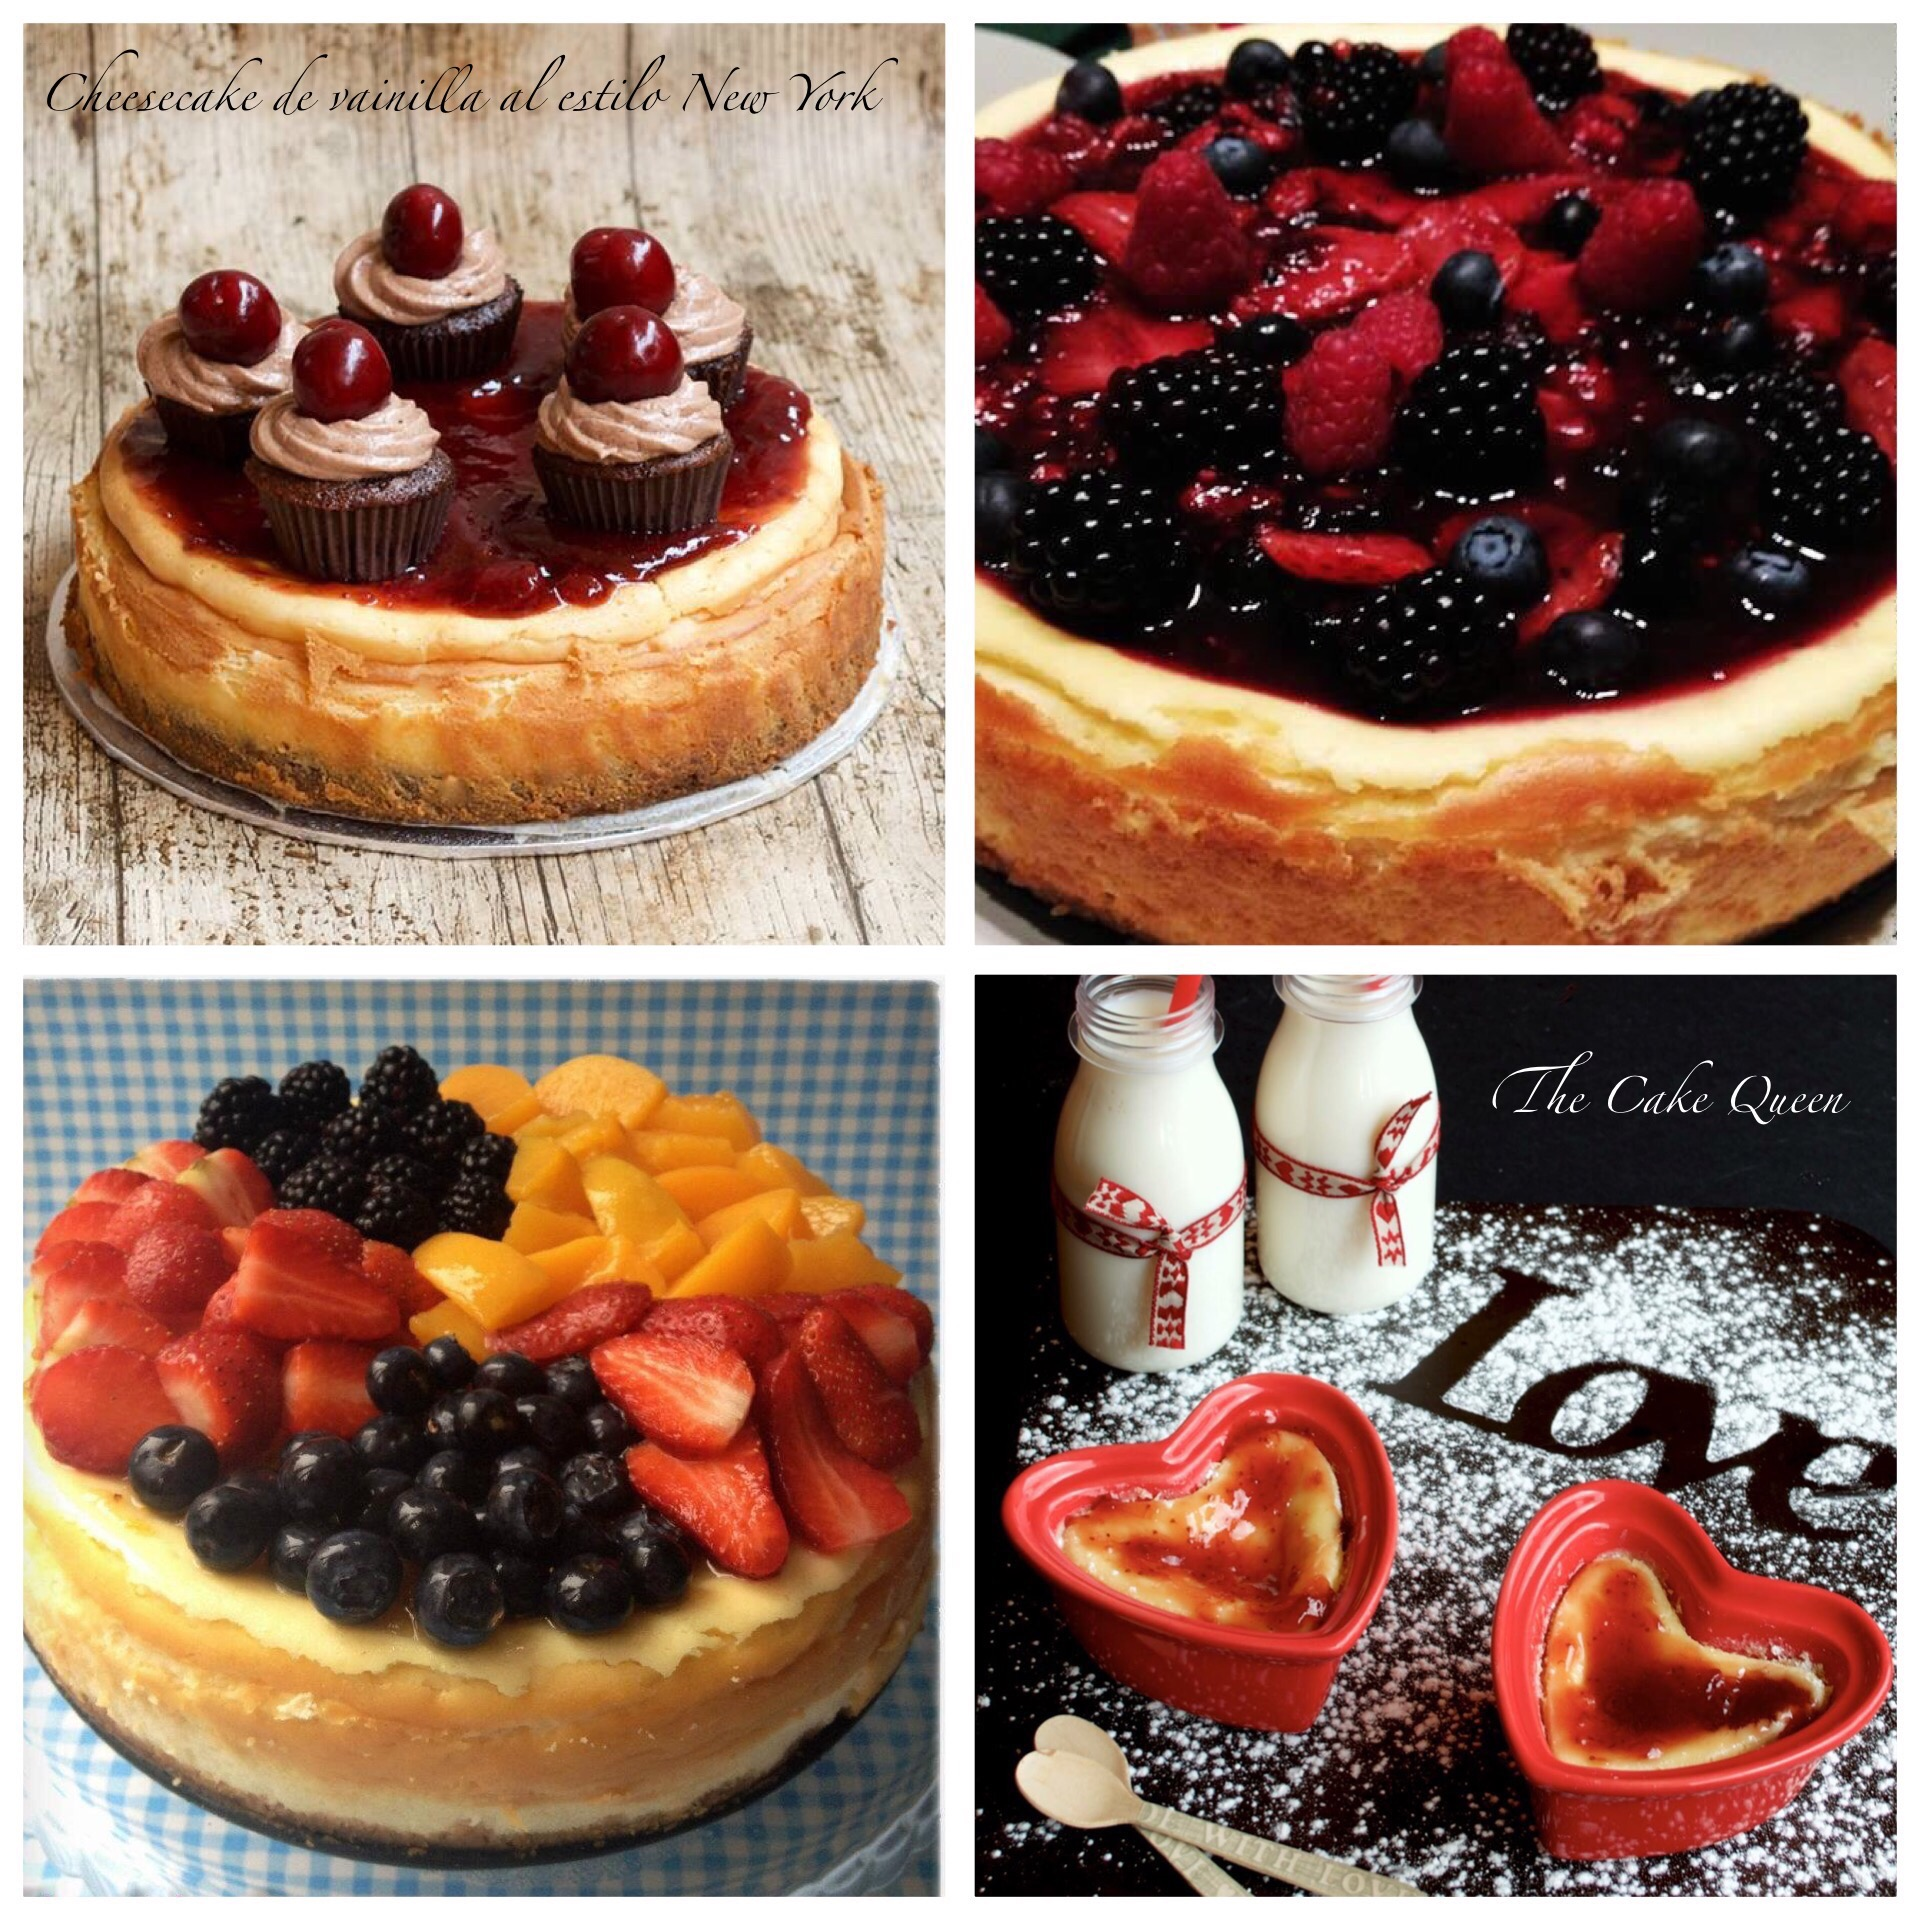 Cheesecake al estilo New York, 4 fotos diferentes en un gran collage de cheesecakes